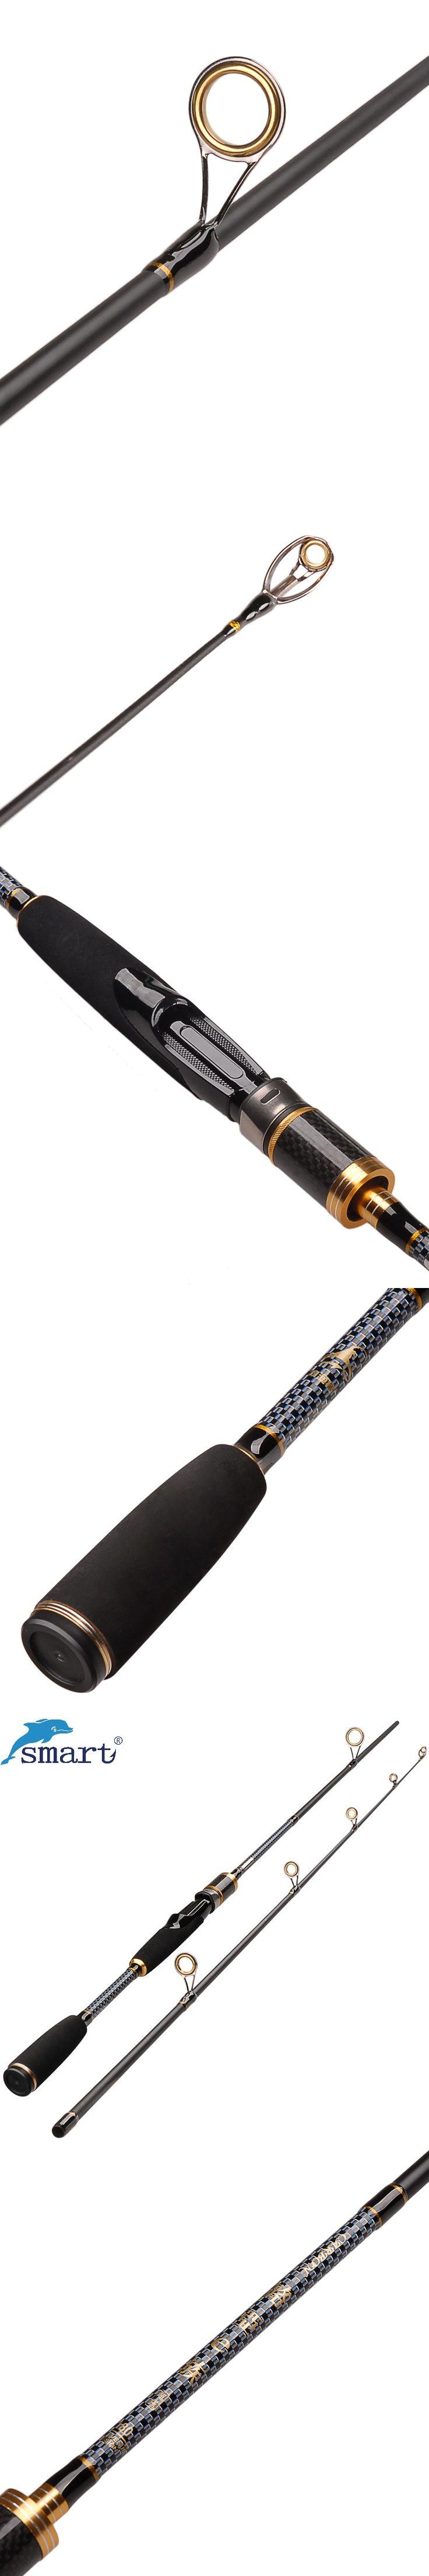 1.8m 2.1m 2.4m 2Section Spinning Fishing Rod Medium Power Carbon Fiber Lure Rods Vara De Pesca Canne A Peche Carp Fishing Tackle